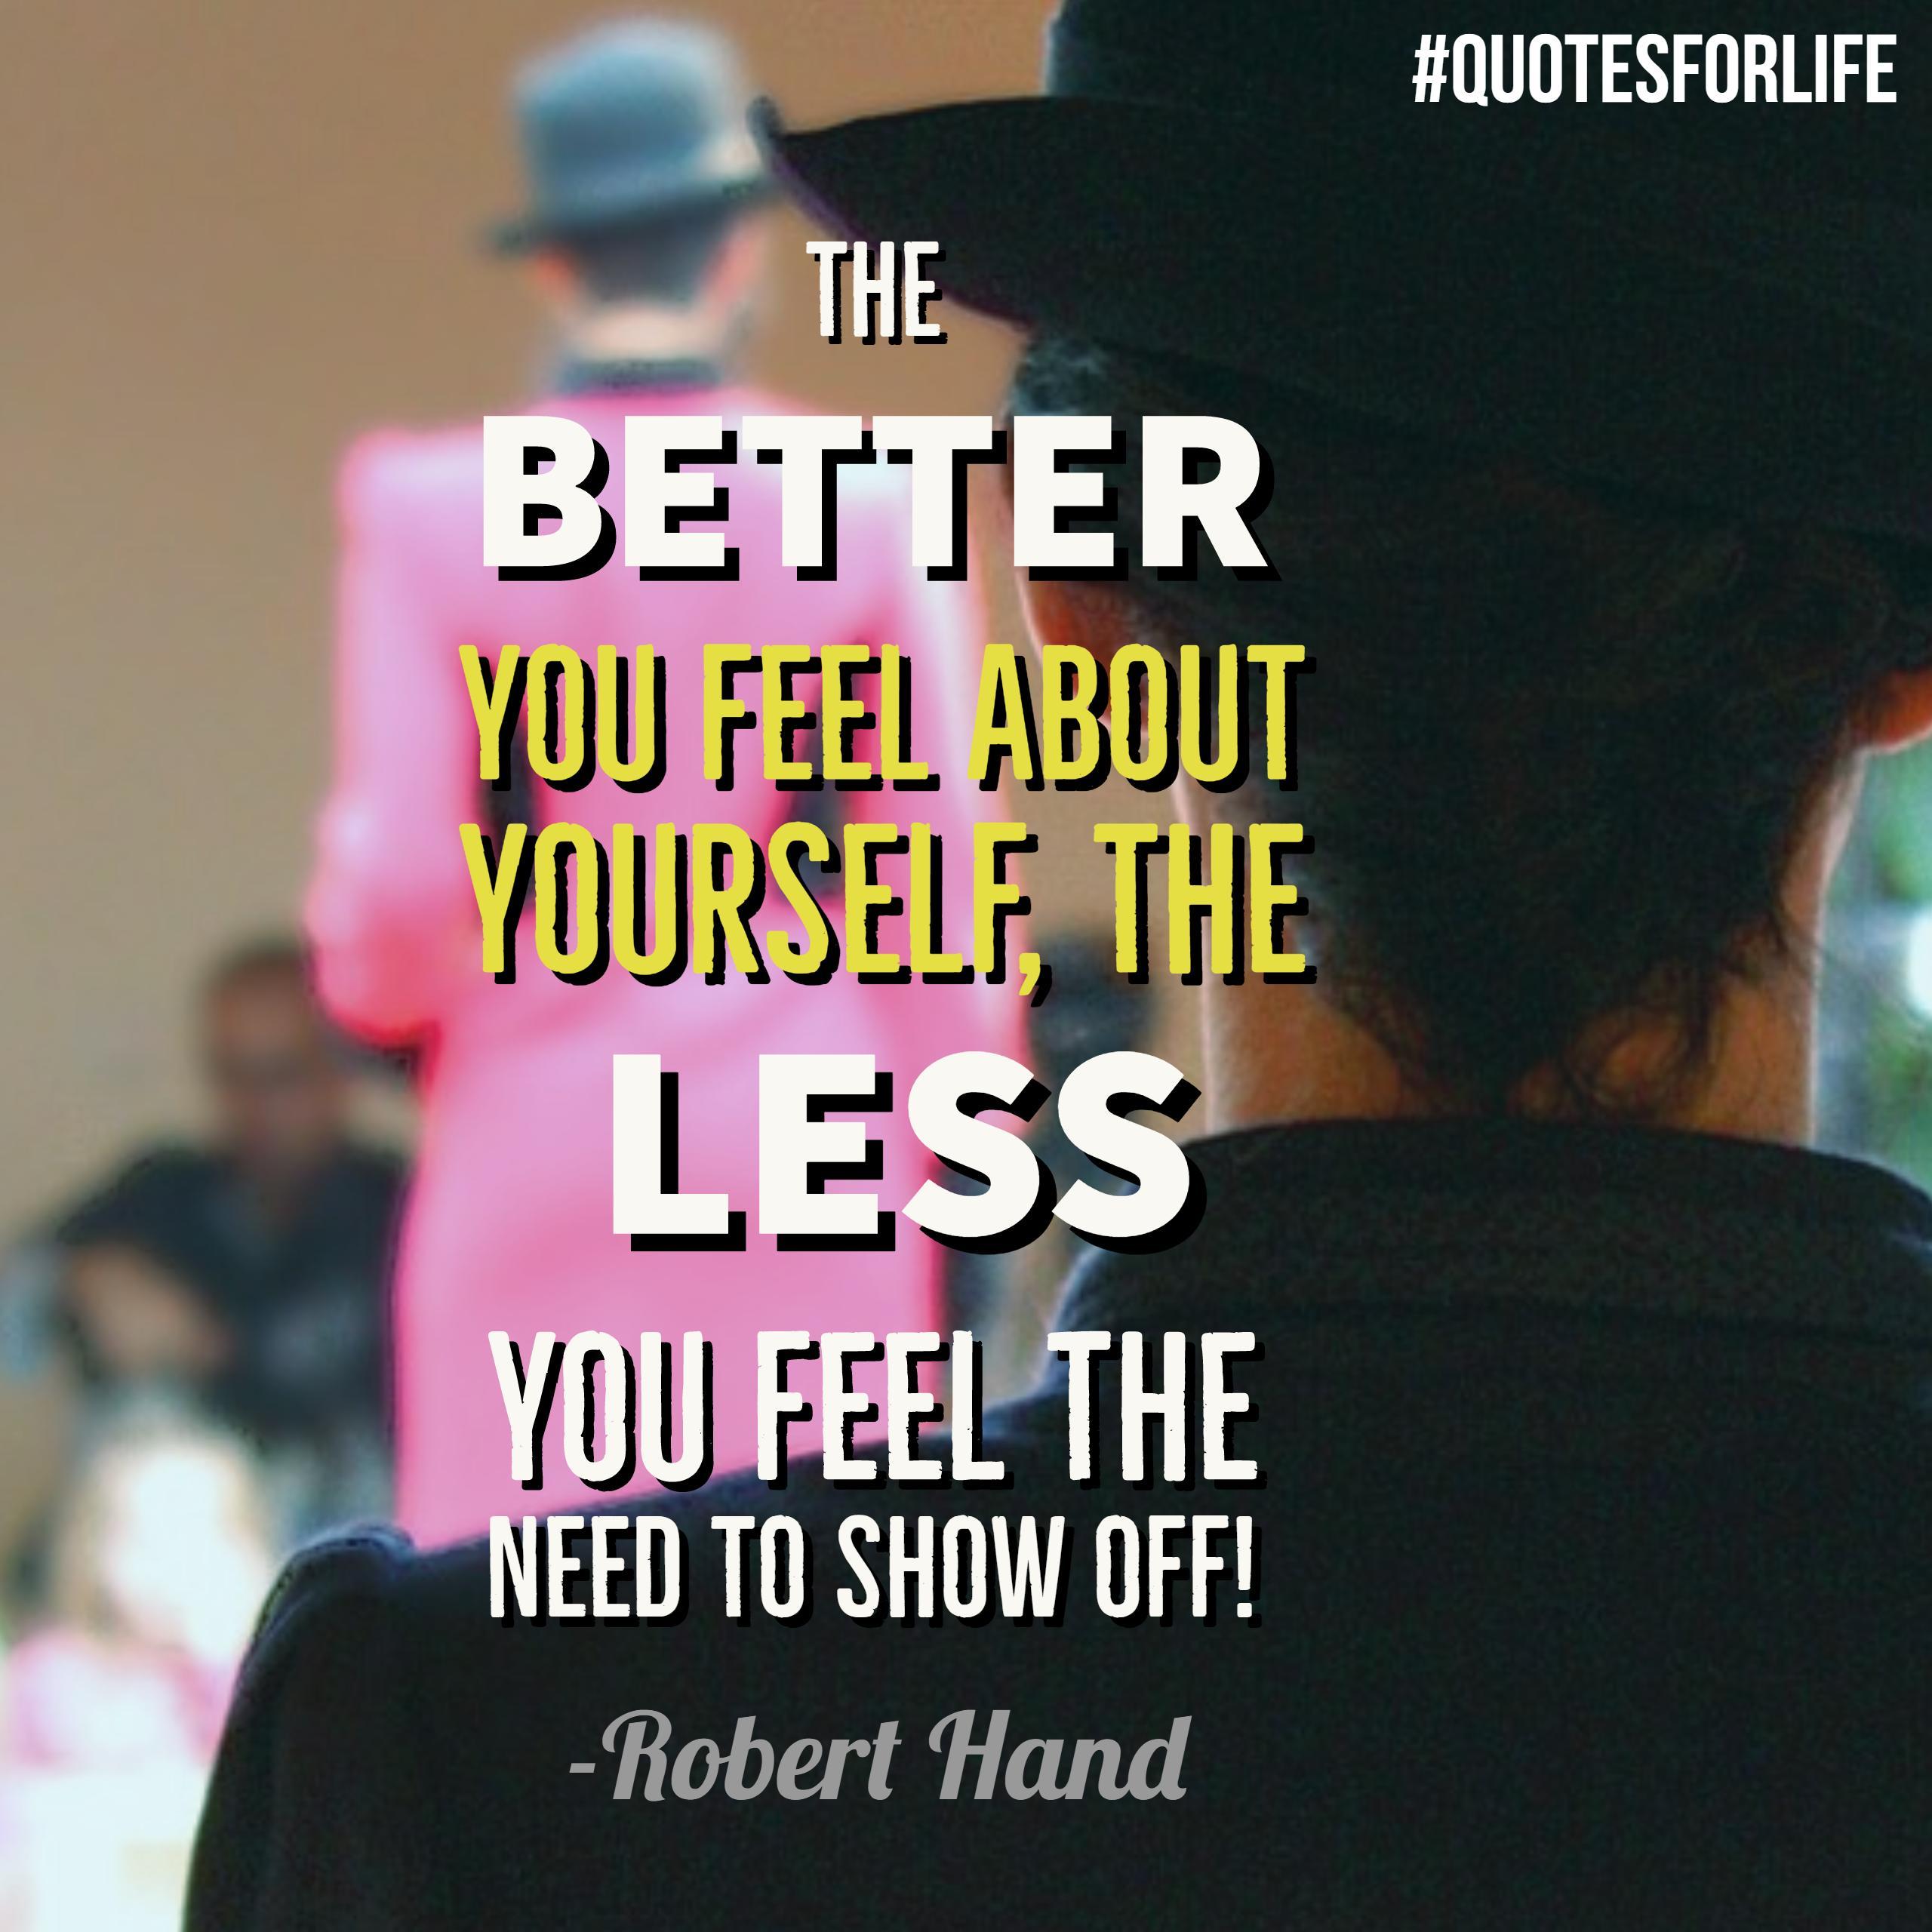 Robert Hand